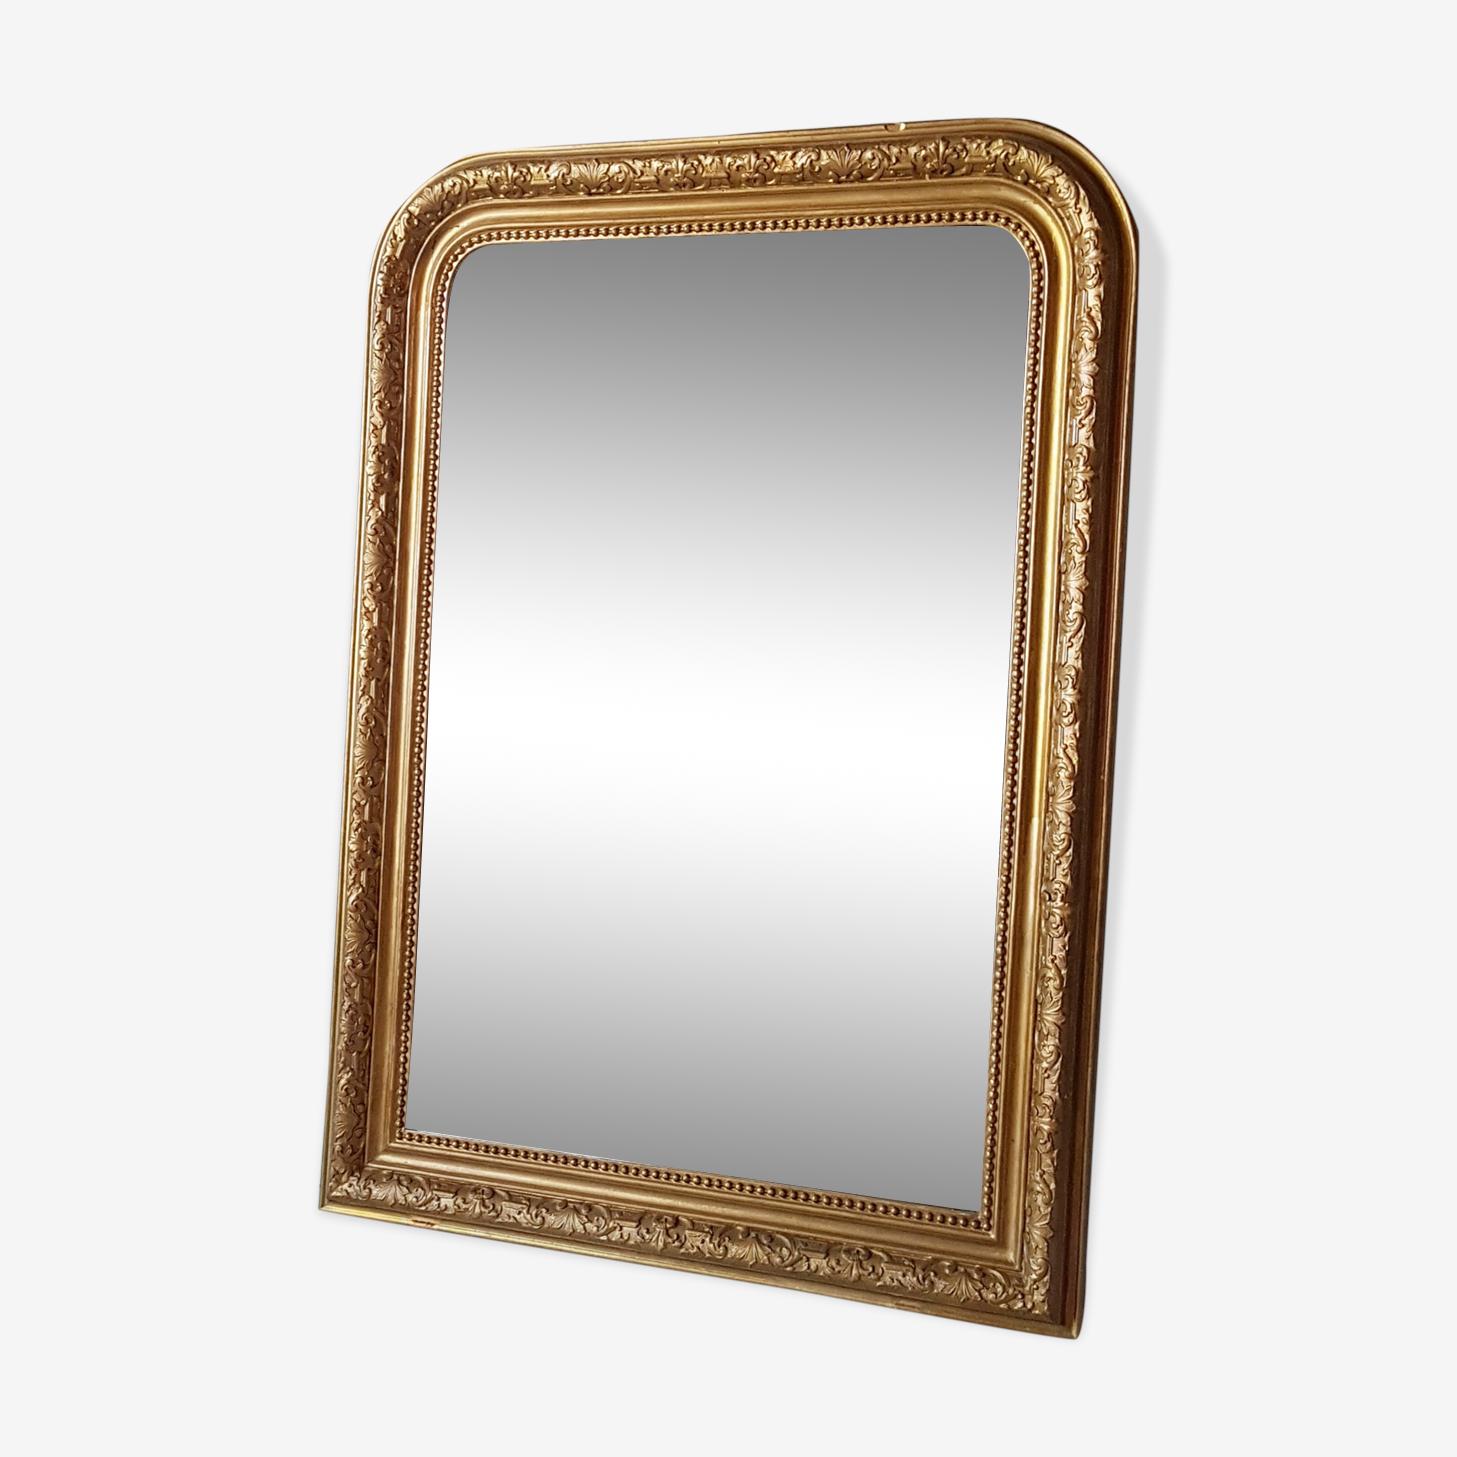 Miroir Louis Philippe ancien 109 X 79 cm